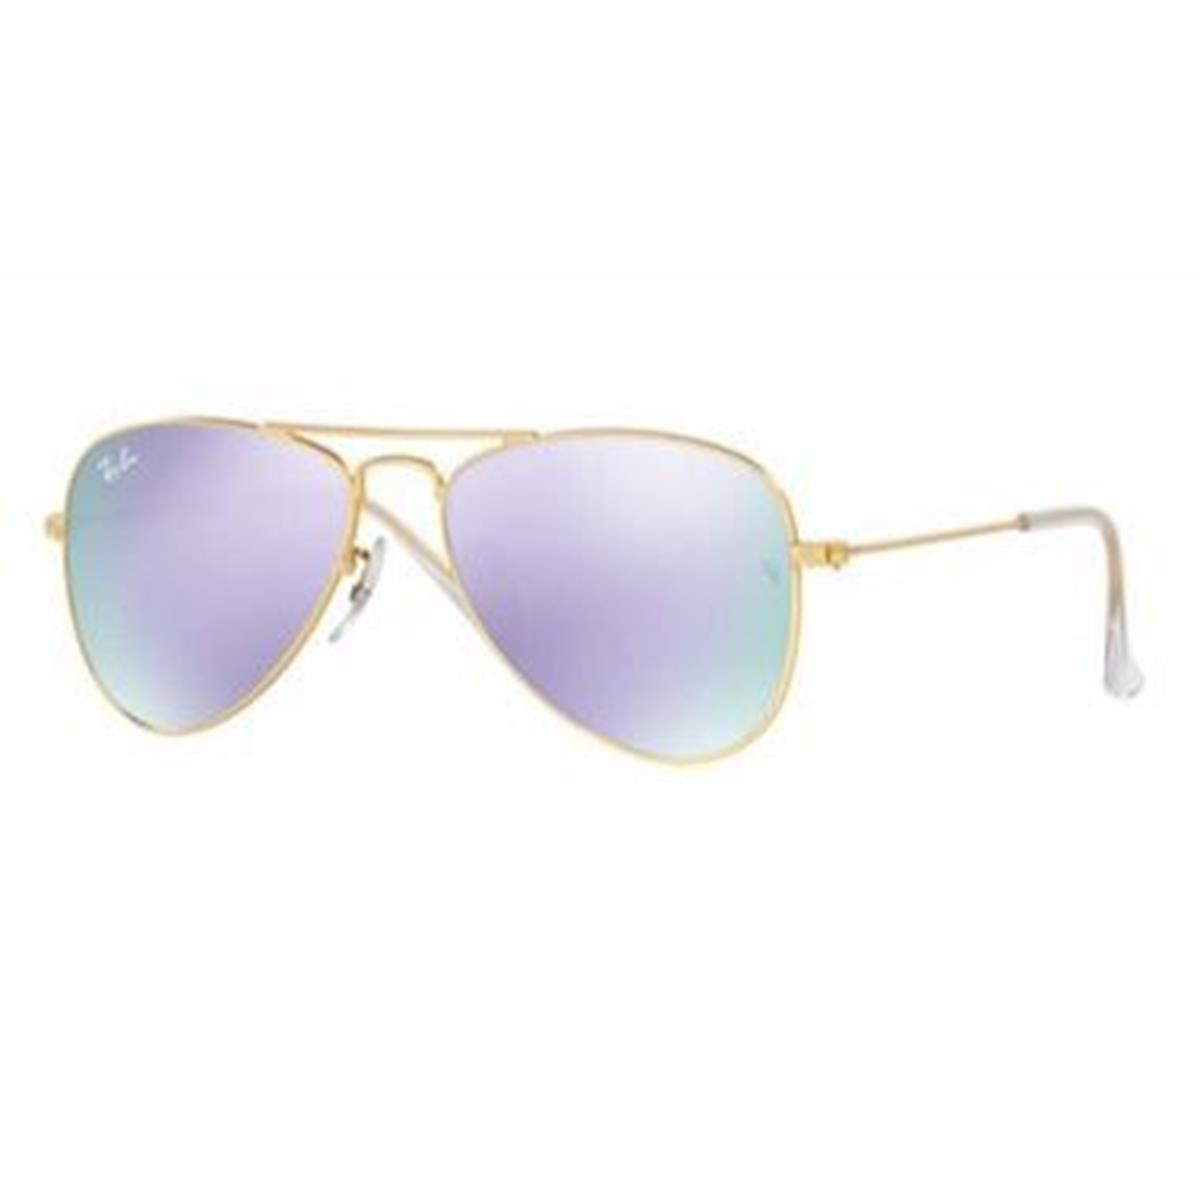 0d8f2e3b762 Amazon.com  Ray-Ban Jr. Kids Aviator Kids Sunglasses (RJ9506) Gold  Matte Purple Metal - Non-Polarized - 50mm  Ray-Ban Junior  Clothing